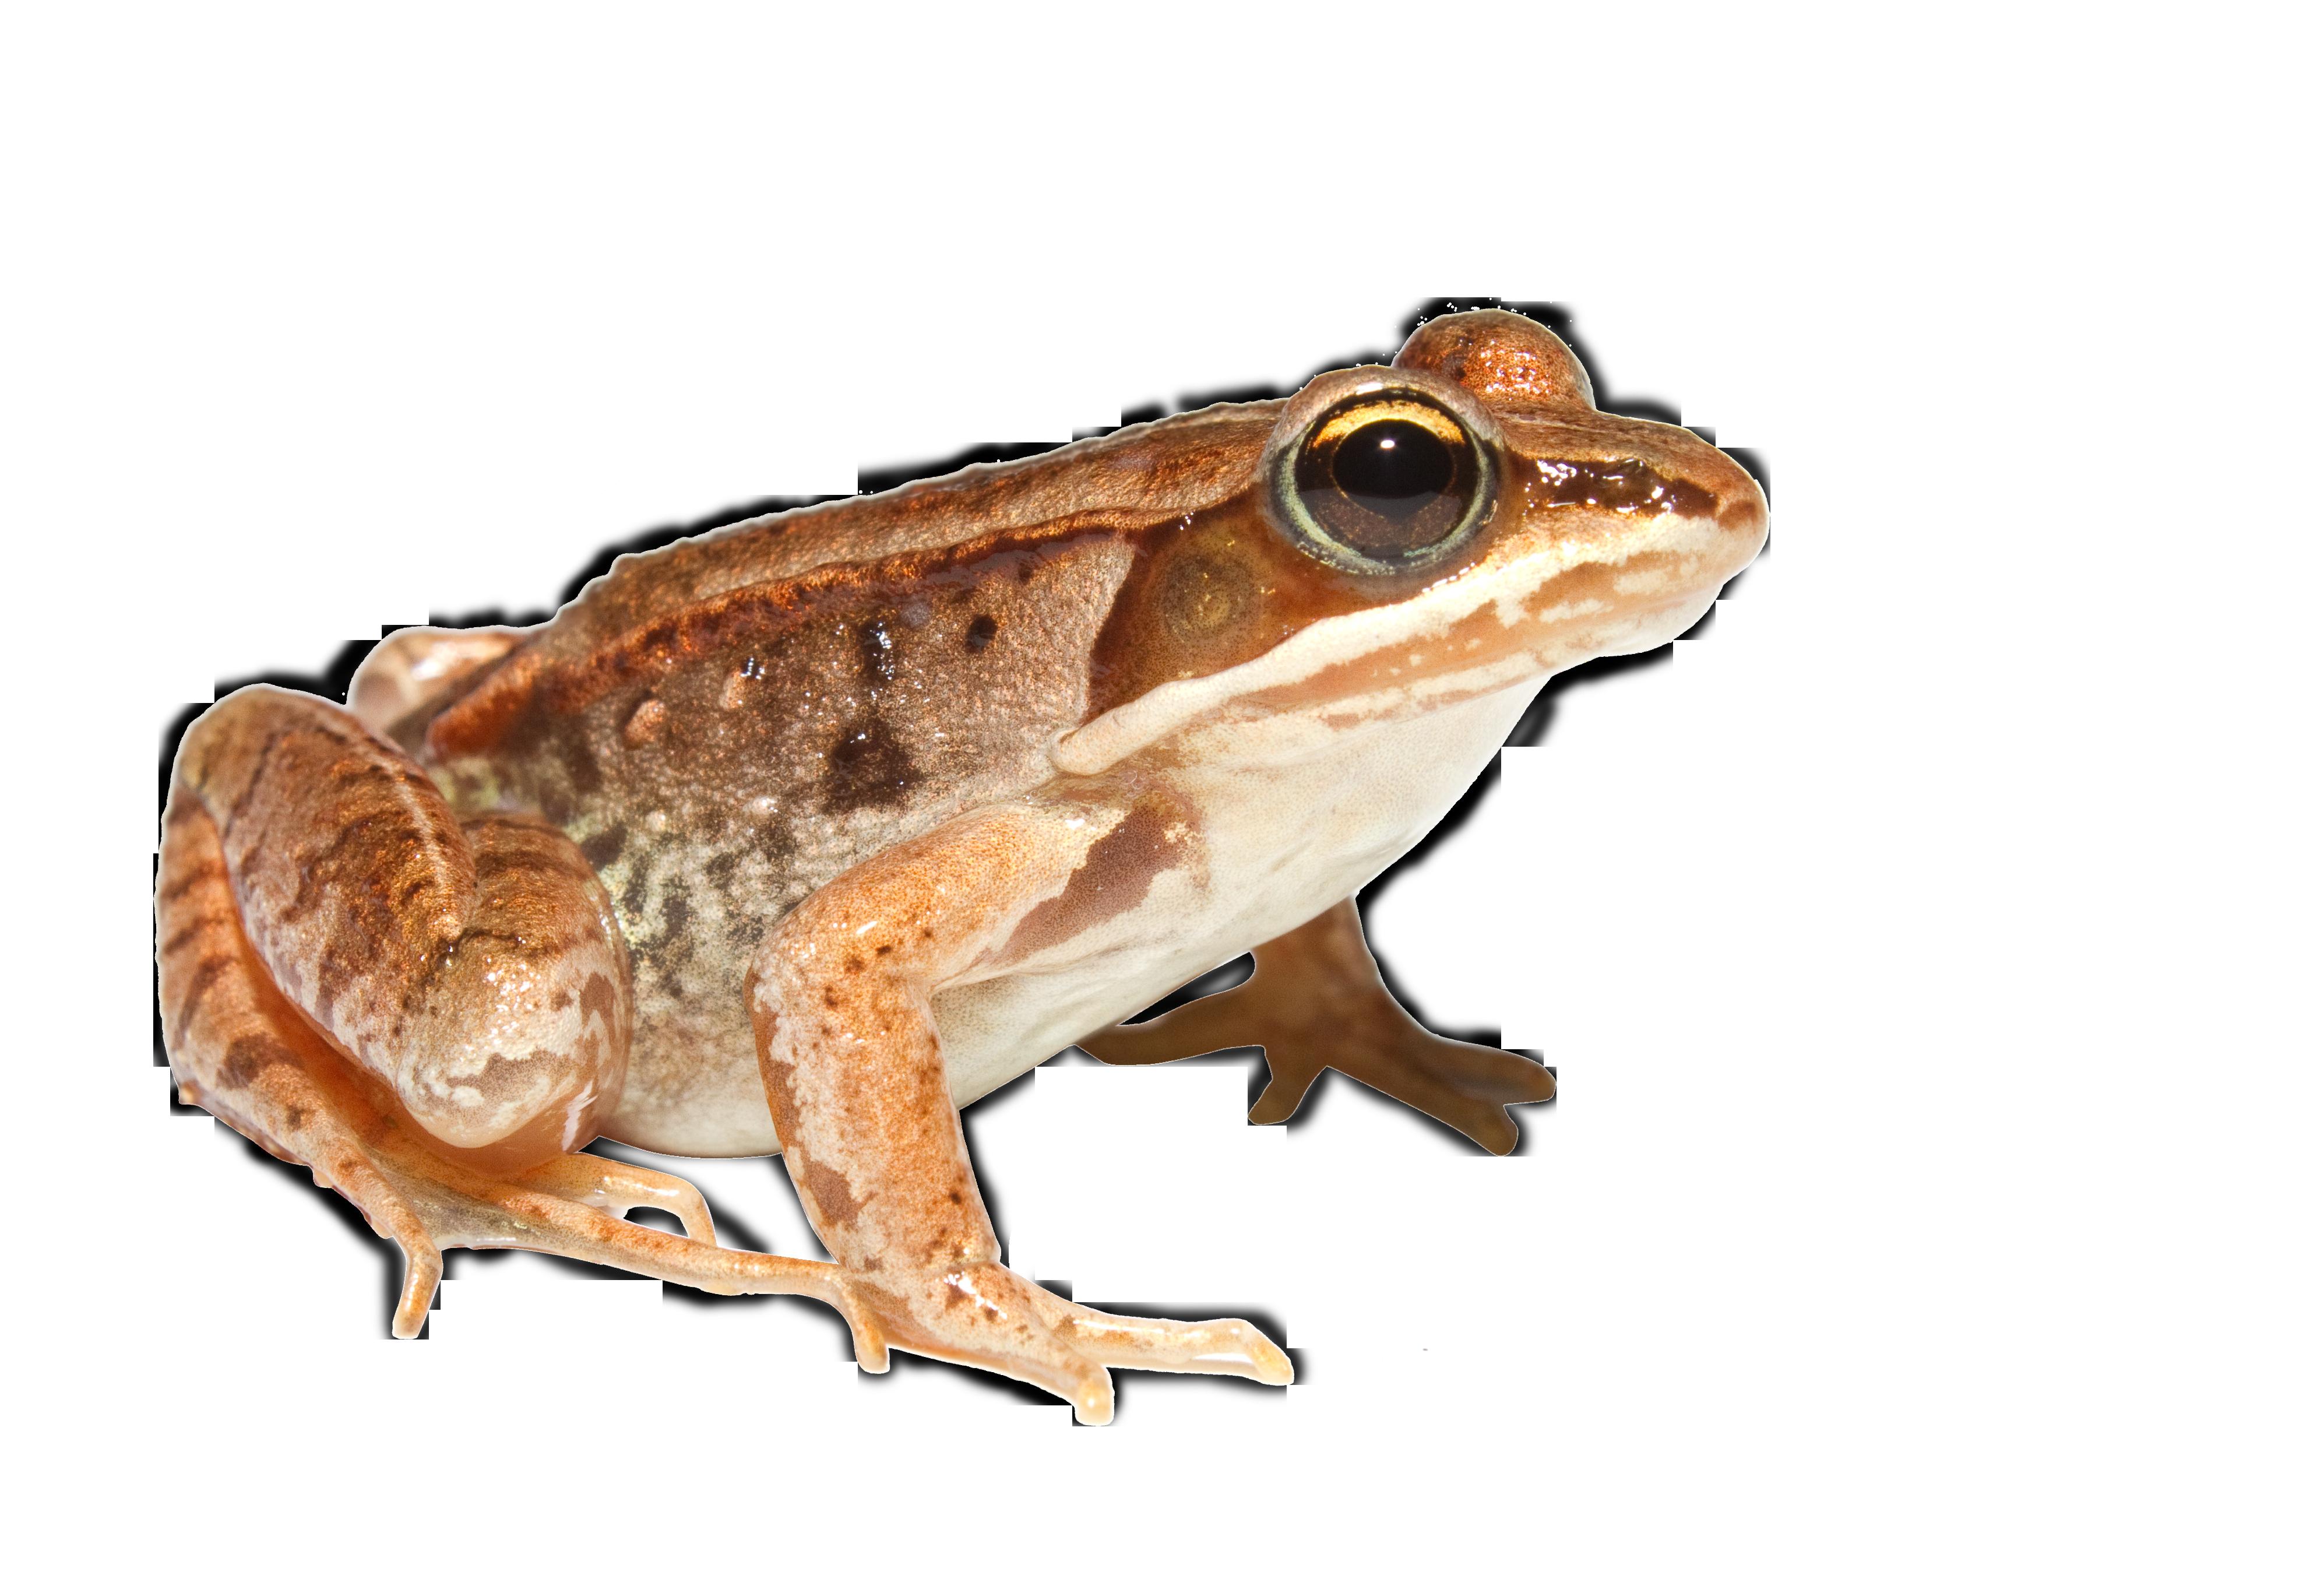 orange Toad PNG Image